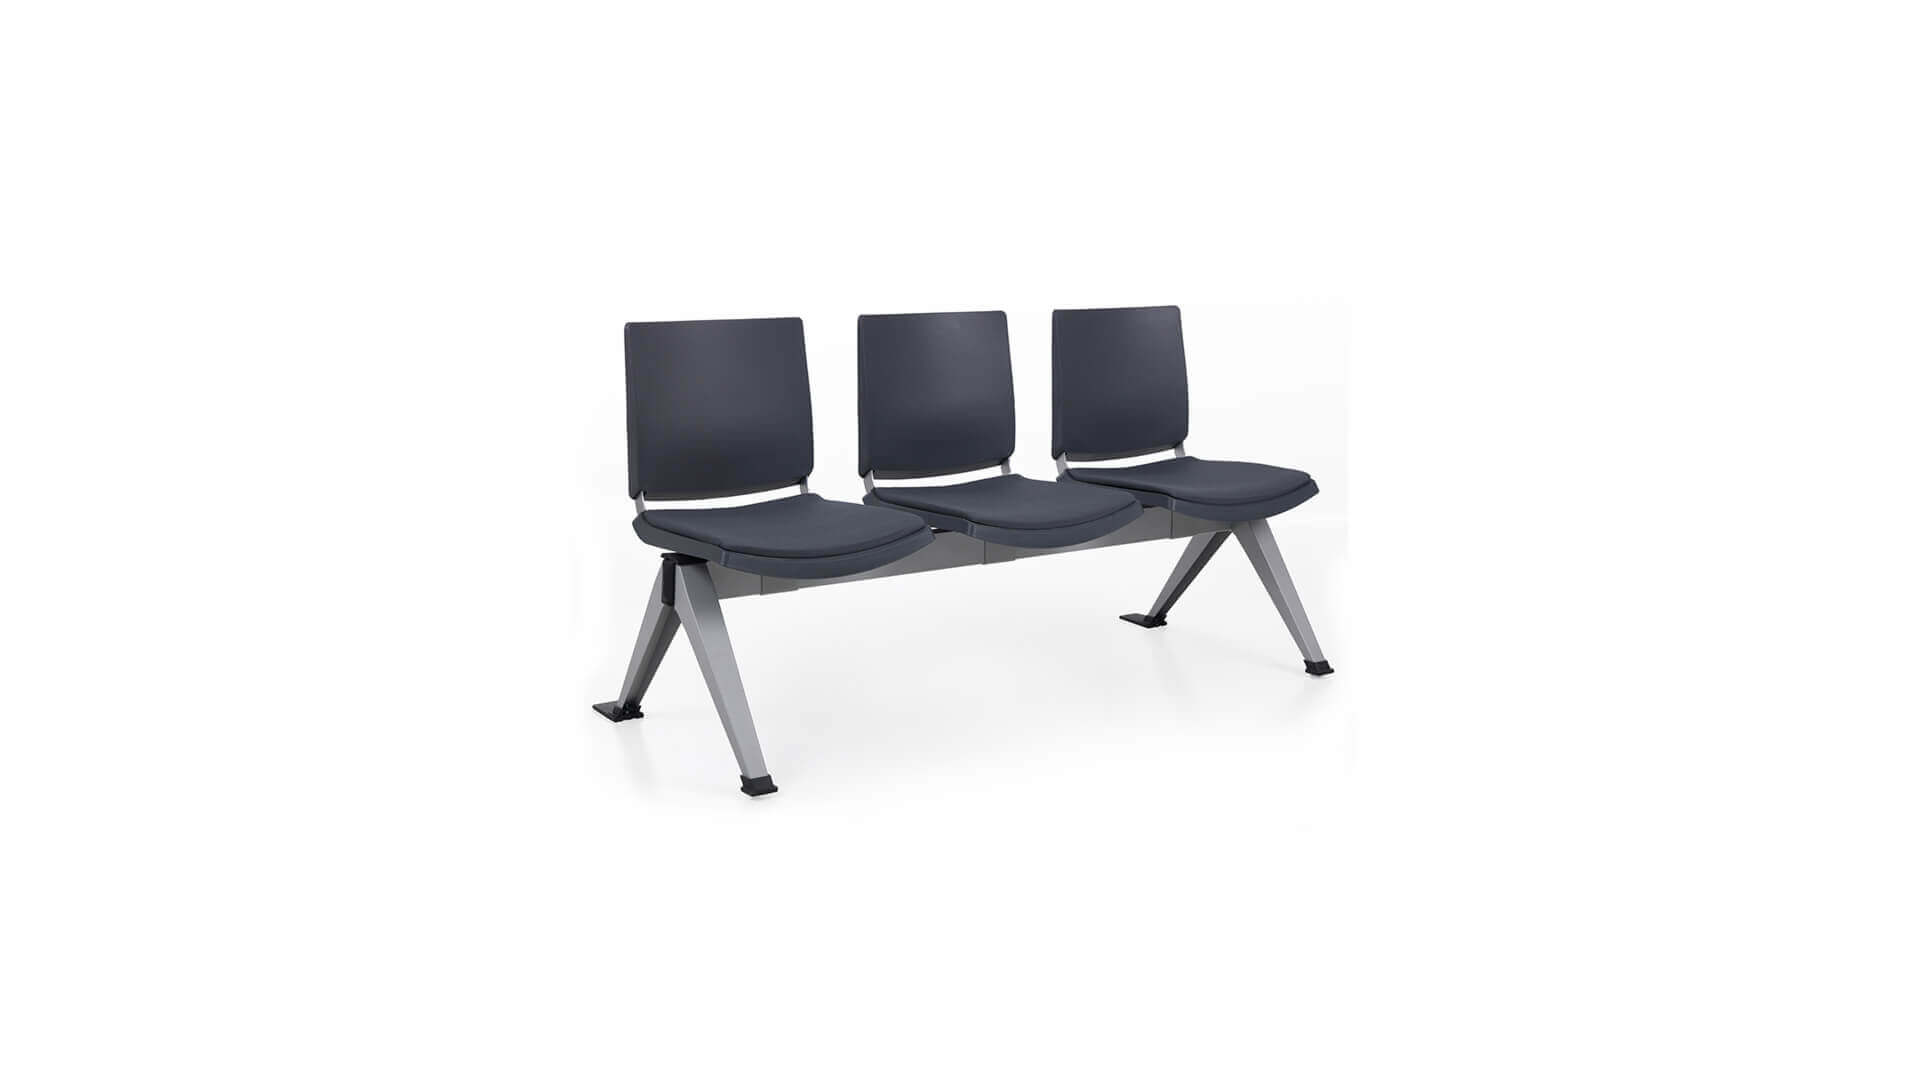 Bancada para salas de espera de 3 asientos